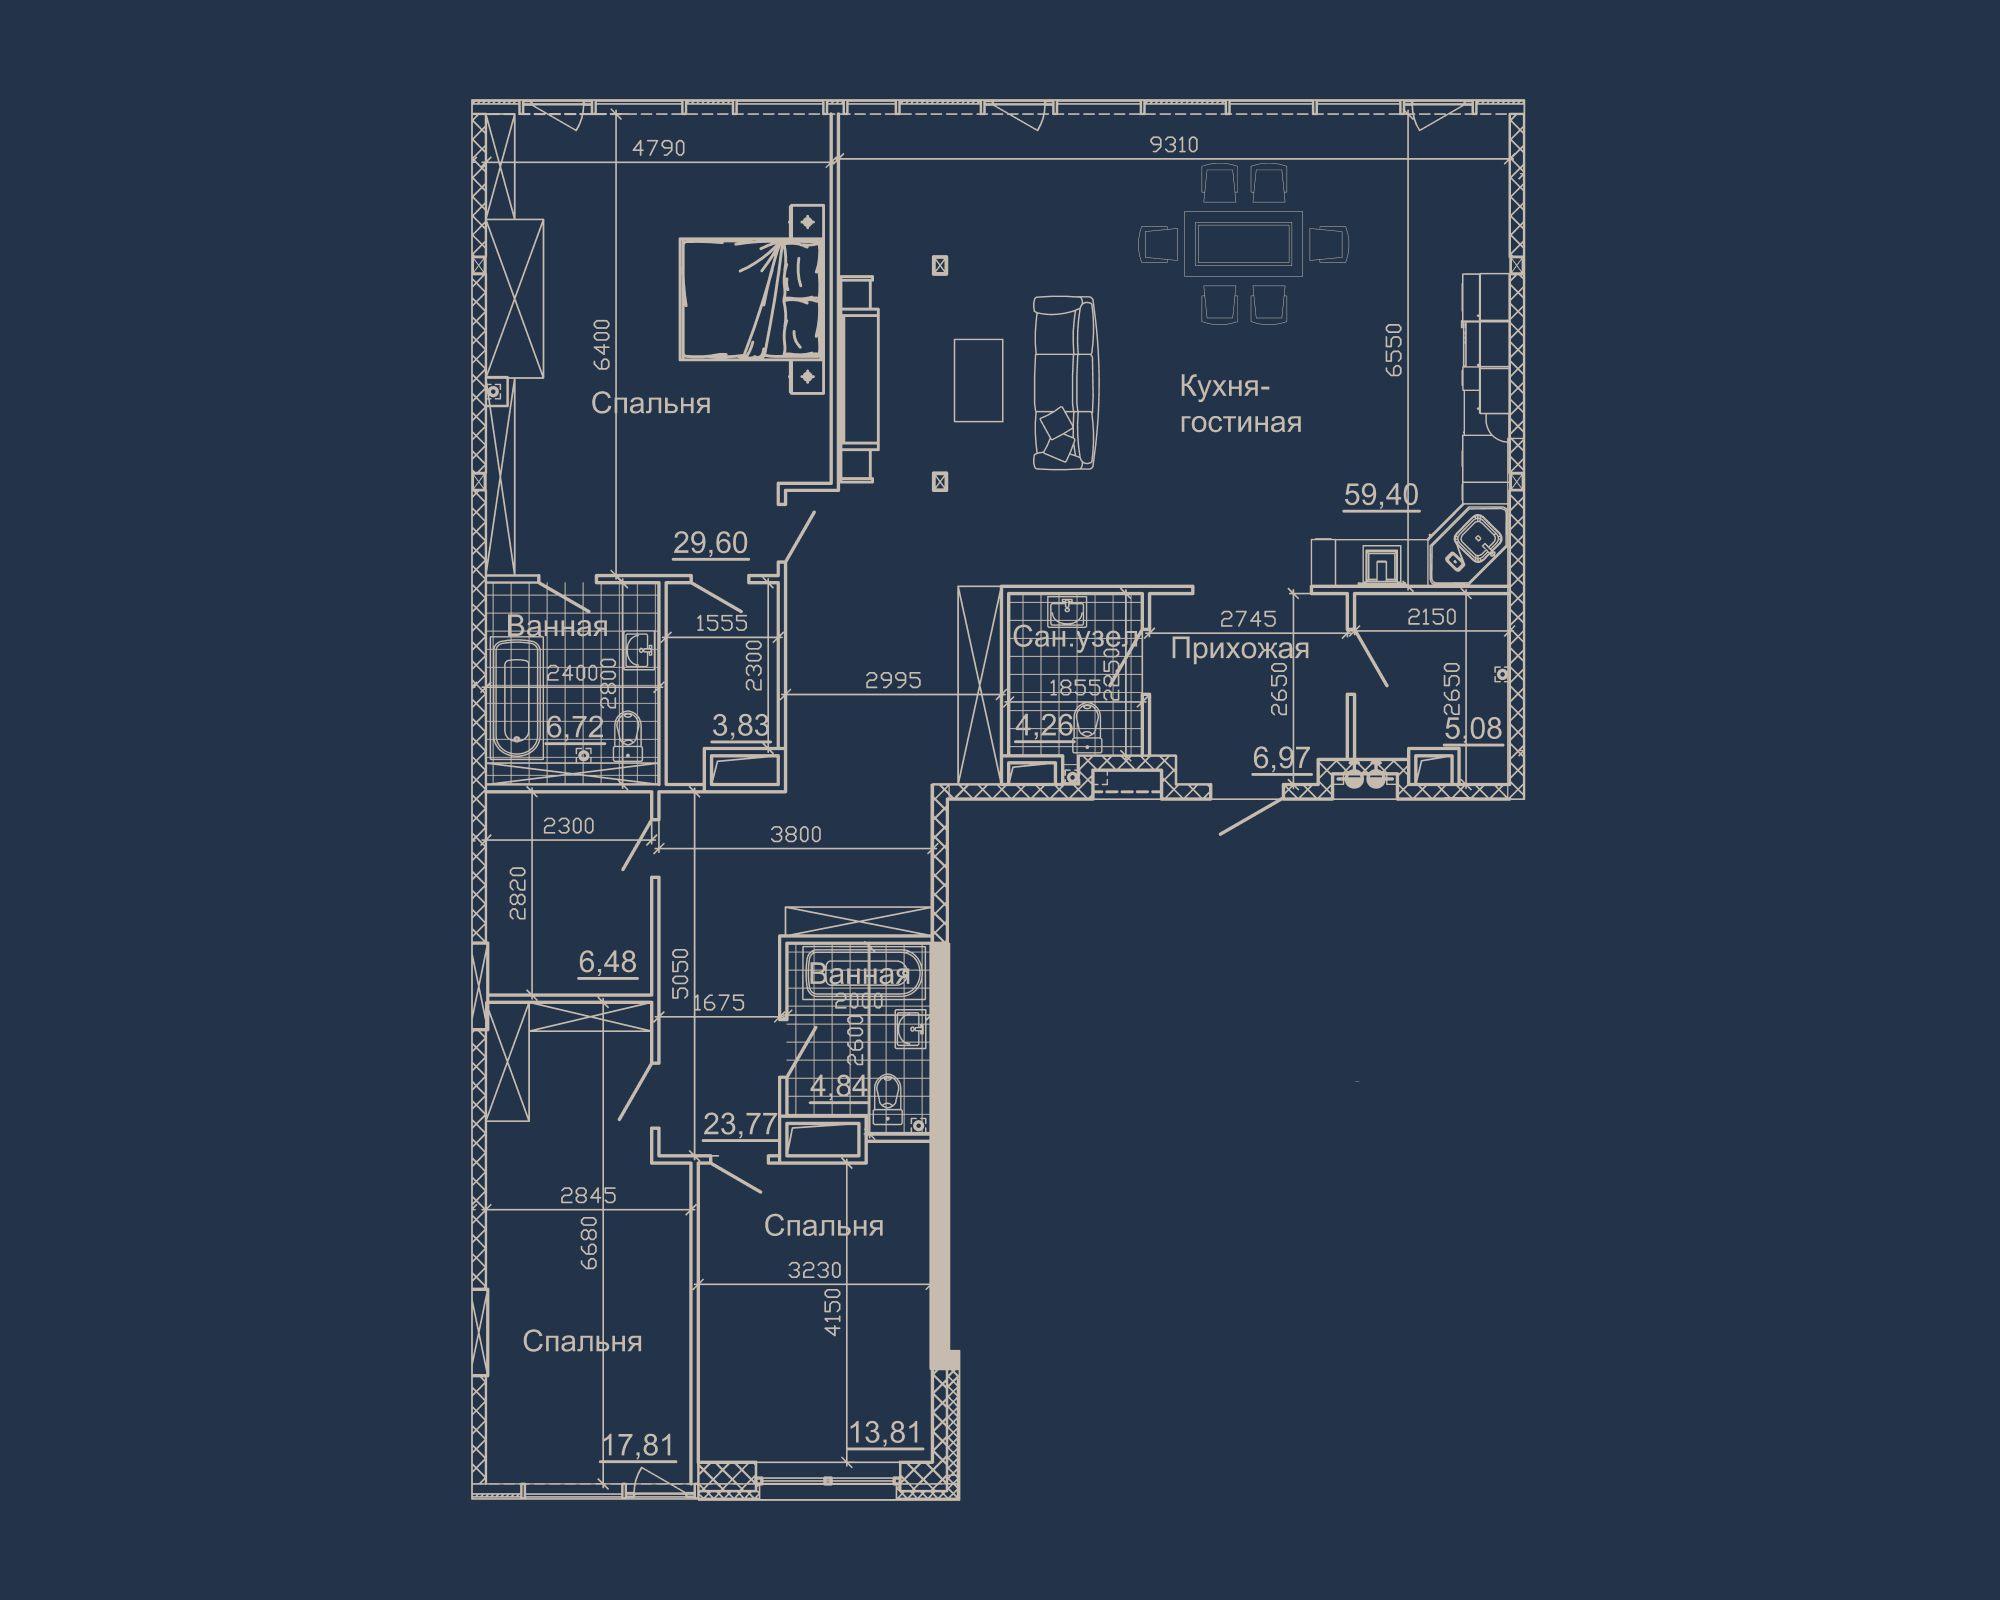 3-кімнатна квартира типу 16А-3 у ЖК Nebo